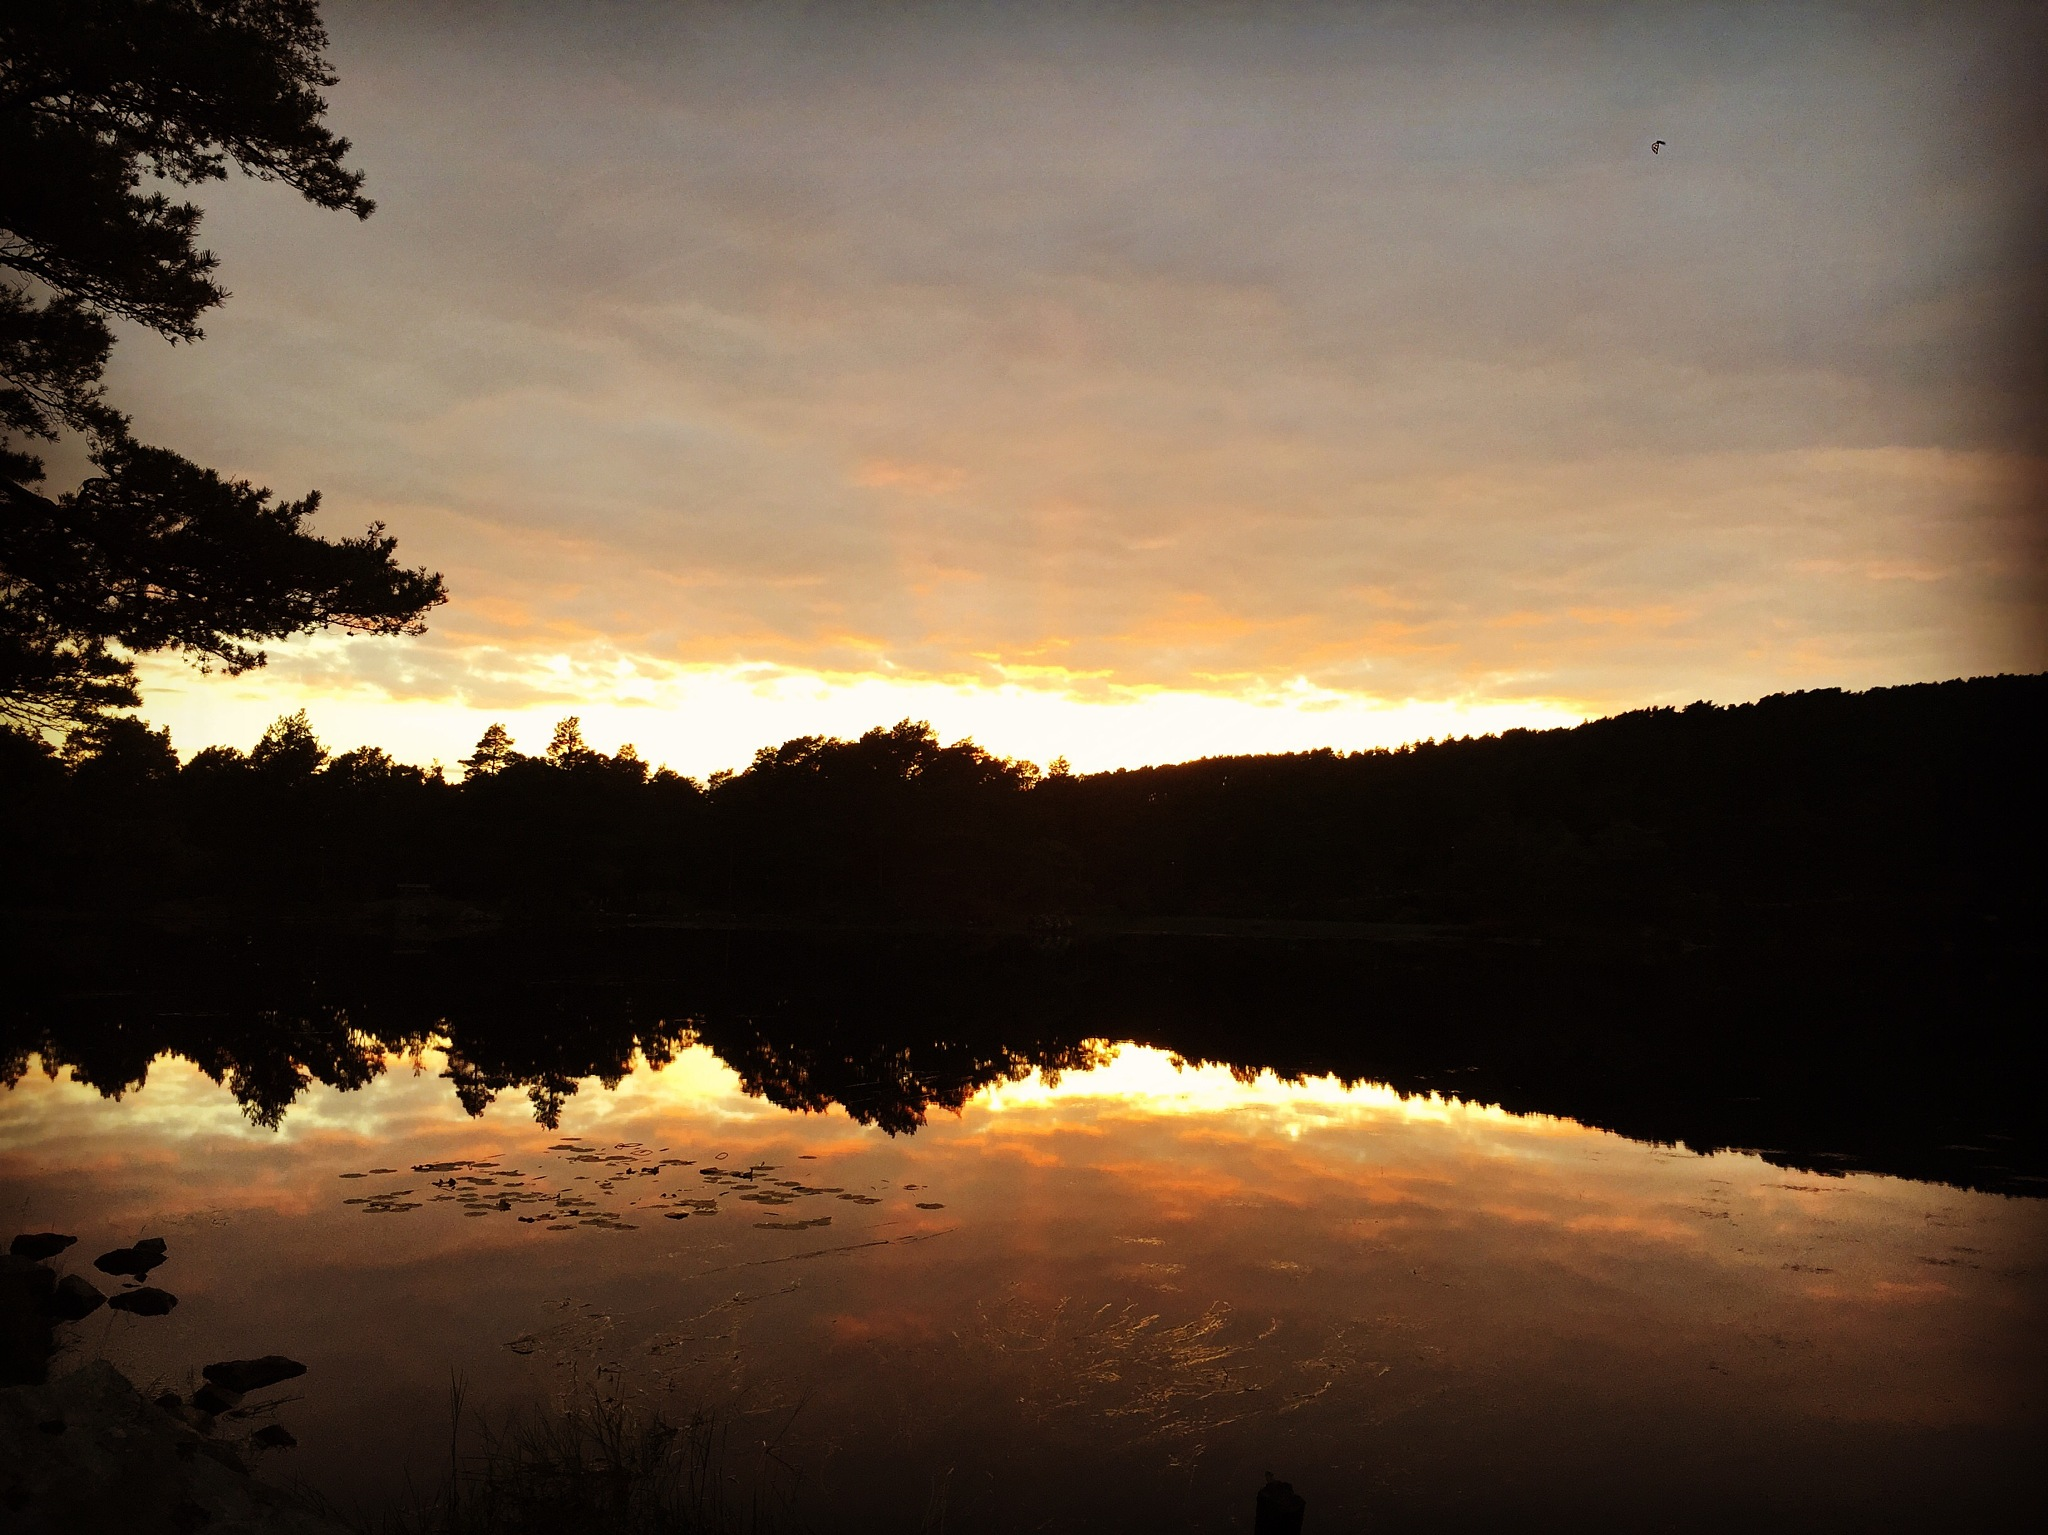 Sunset by Kristin M Rabben